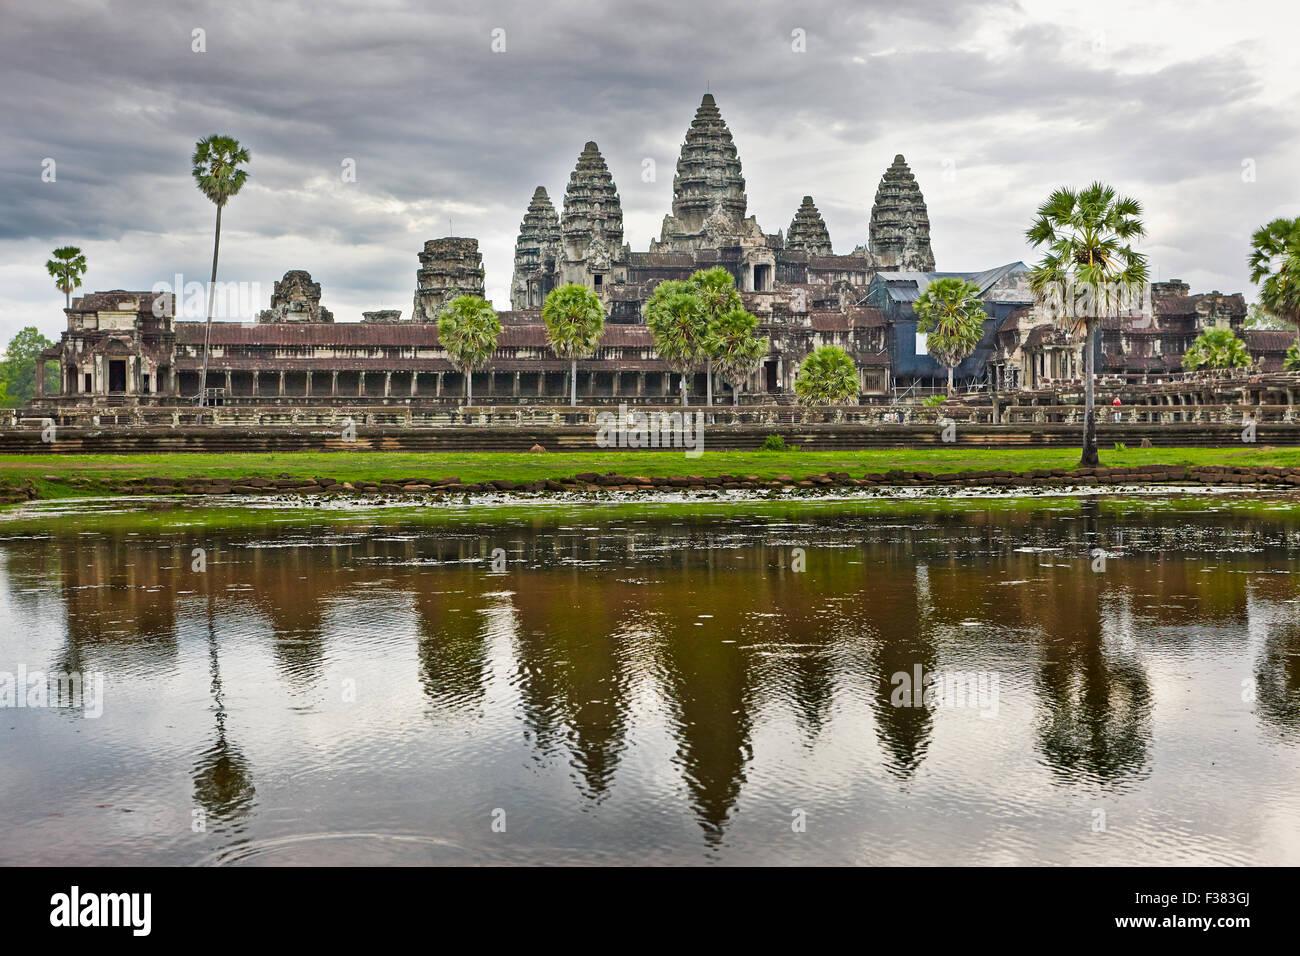 Angkor Wat. Parco Archeologico di Angkor, Siem Reap Provincia, in Cambogia. Immagini Stock